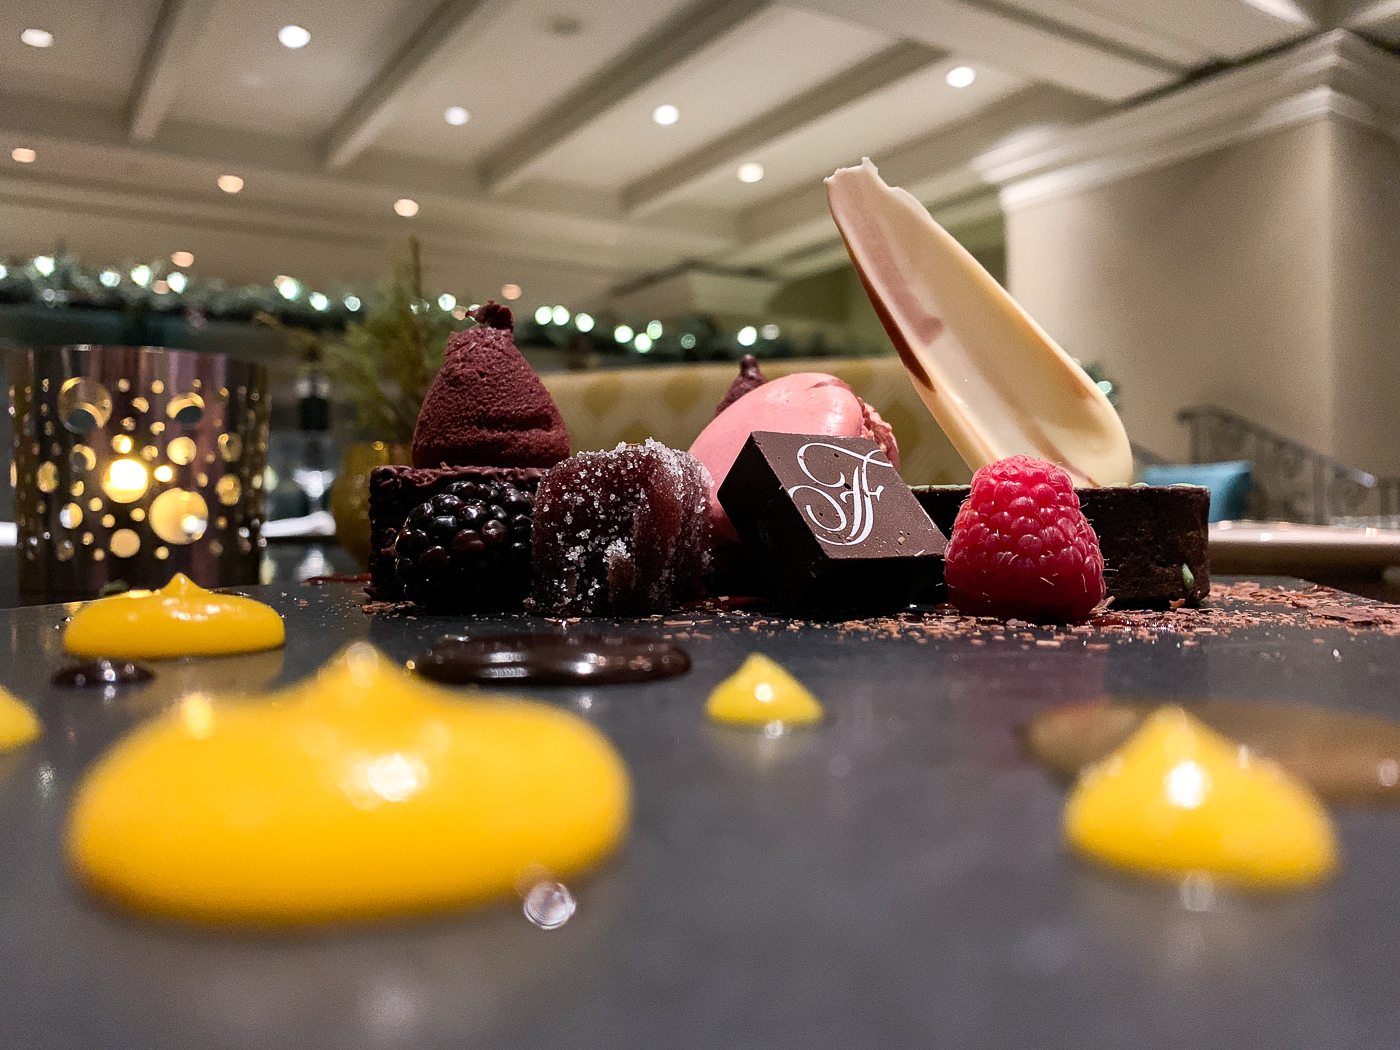 Plateau de chocolat et desserts - Resto Wilfrid'sa